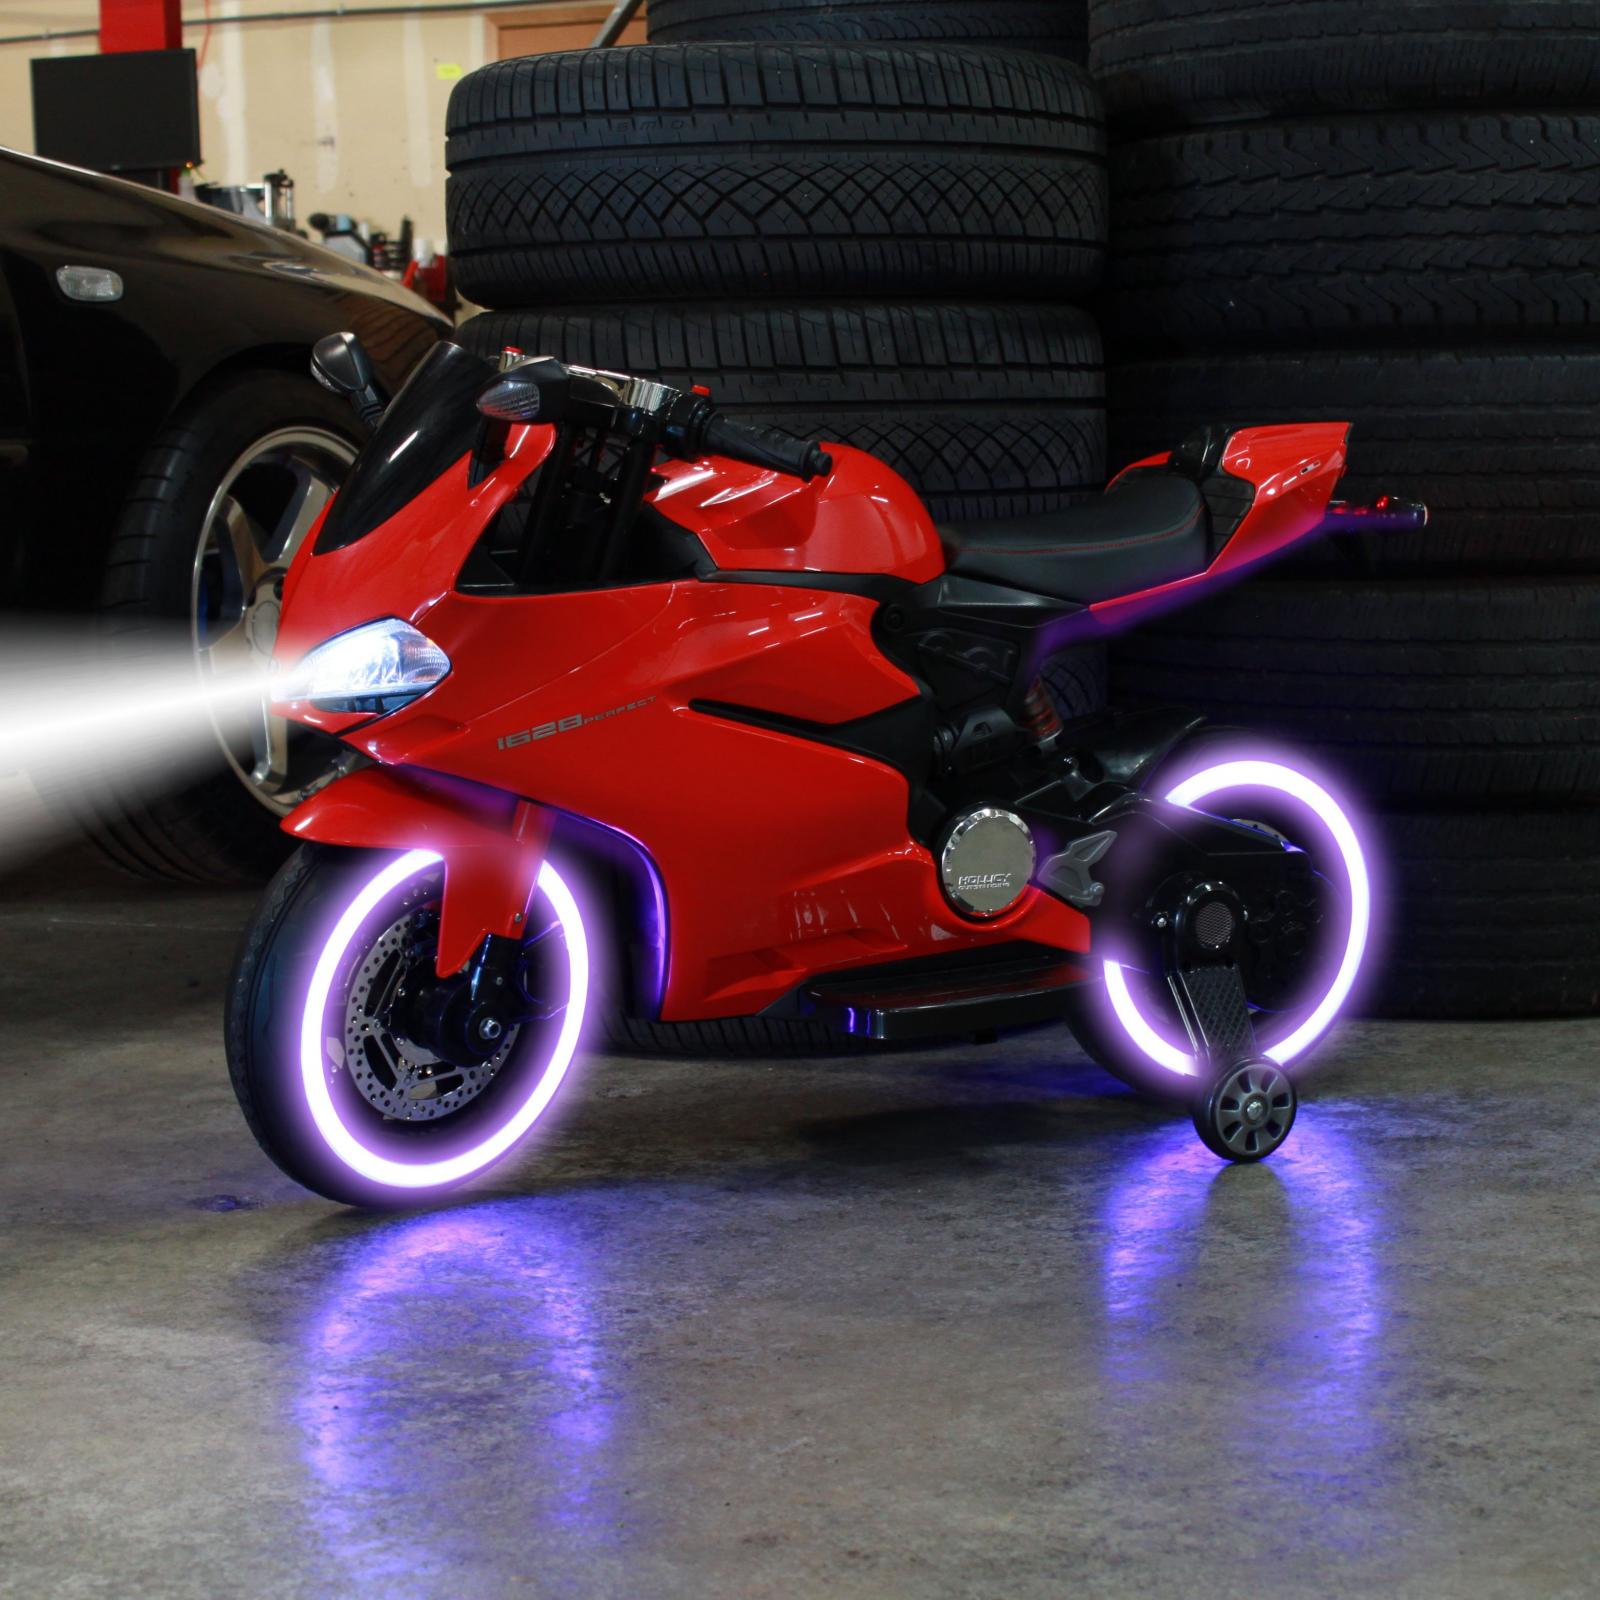 TychoTyke Kids Ride On Motorcycle Tron Bike Light Up Red